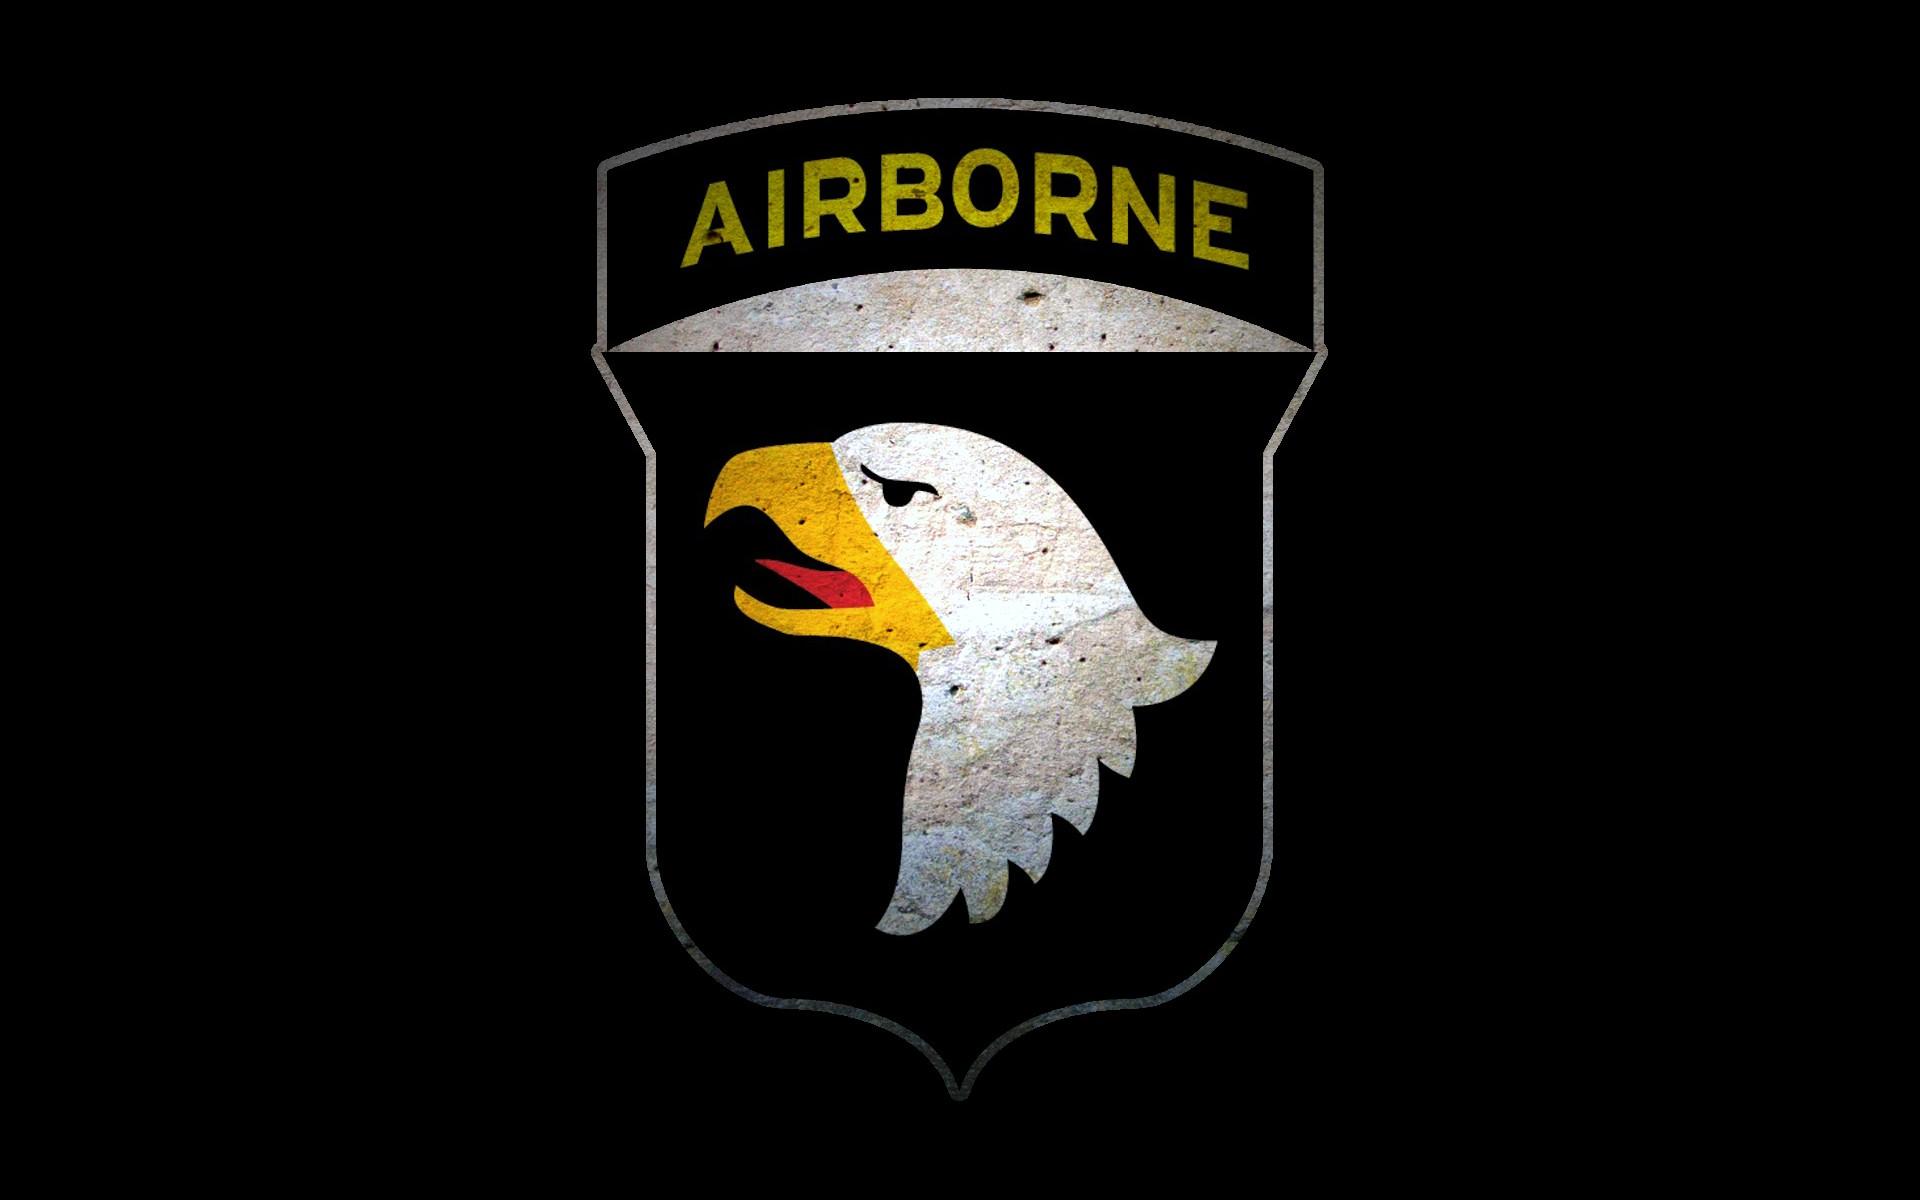 Army Airborne 1920x1200